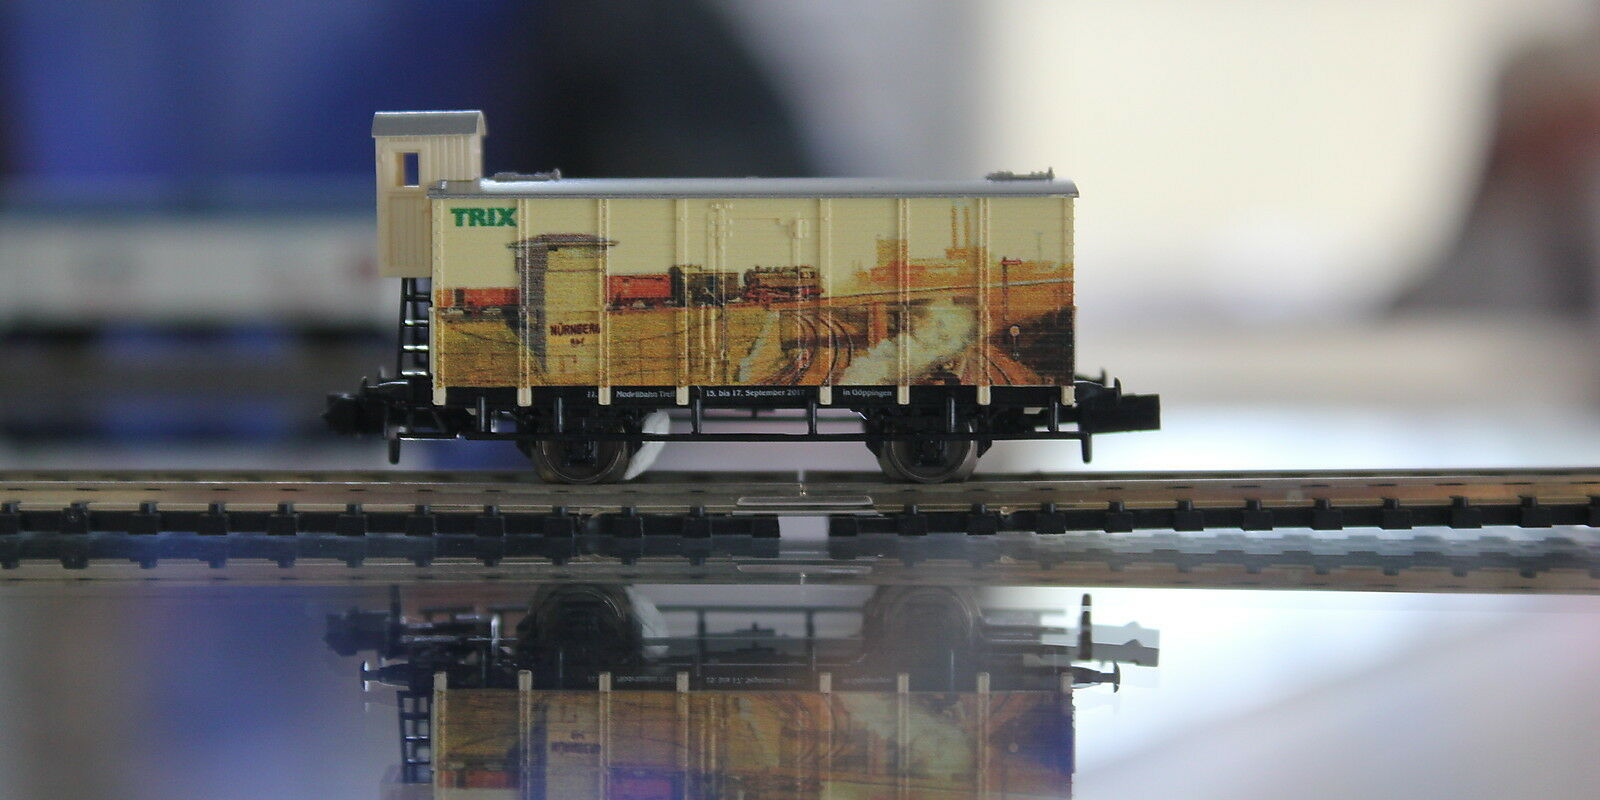 Trix 91111 IMA Special Vehicle 11. Model Train Exhibition 2017 in the Tin